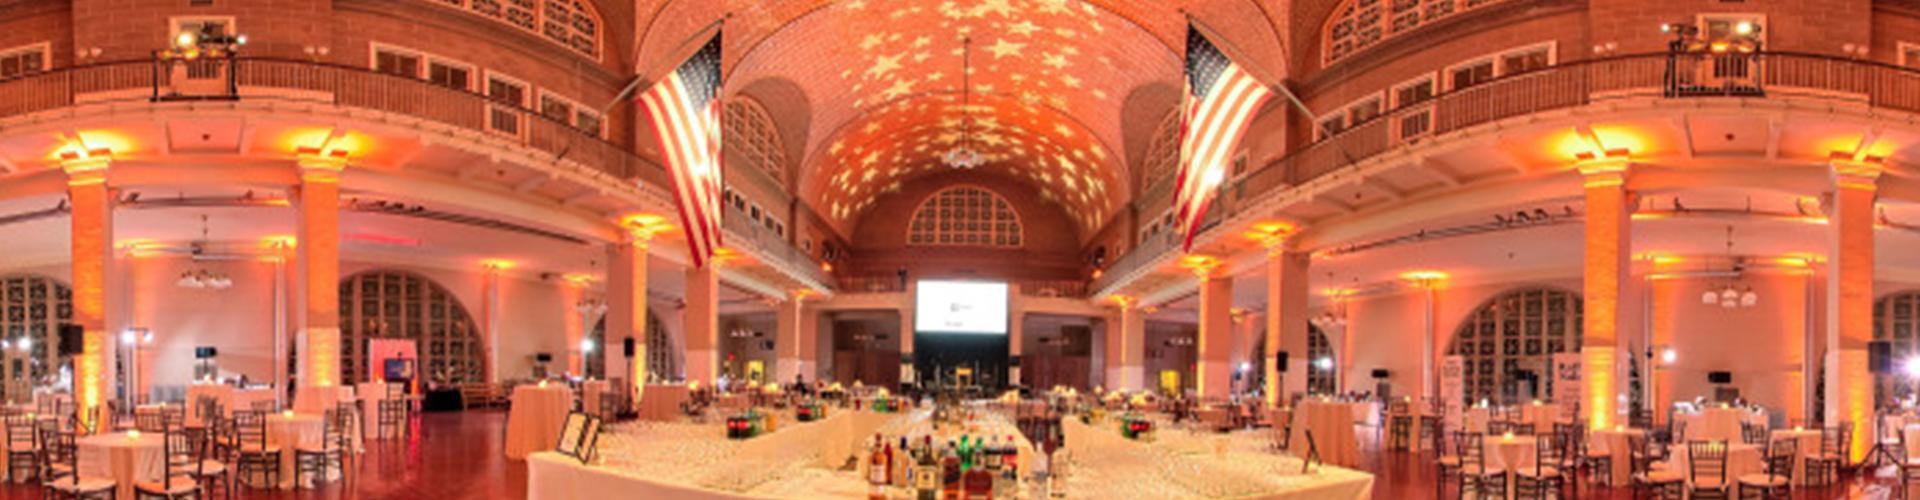 Ellis-Island-Ballroom-by-360sitevisit